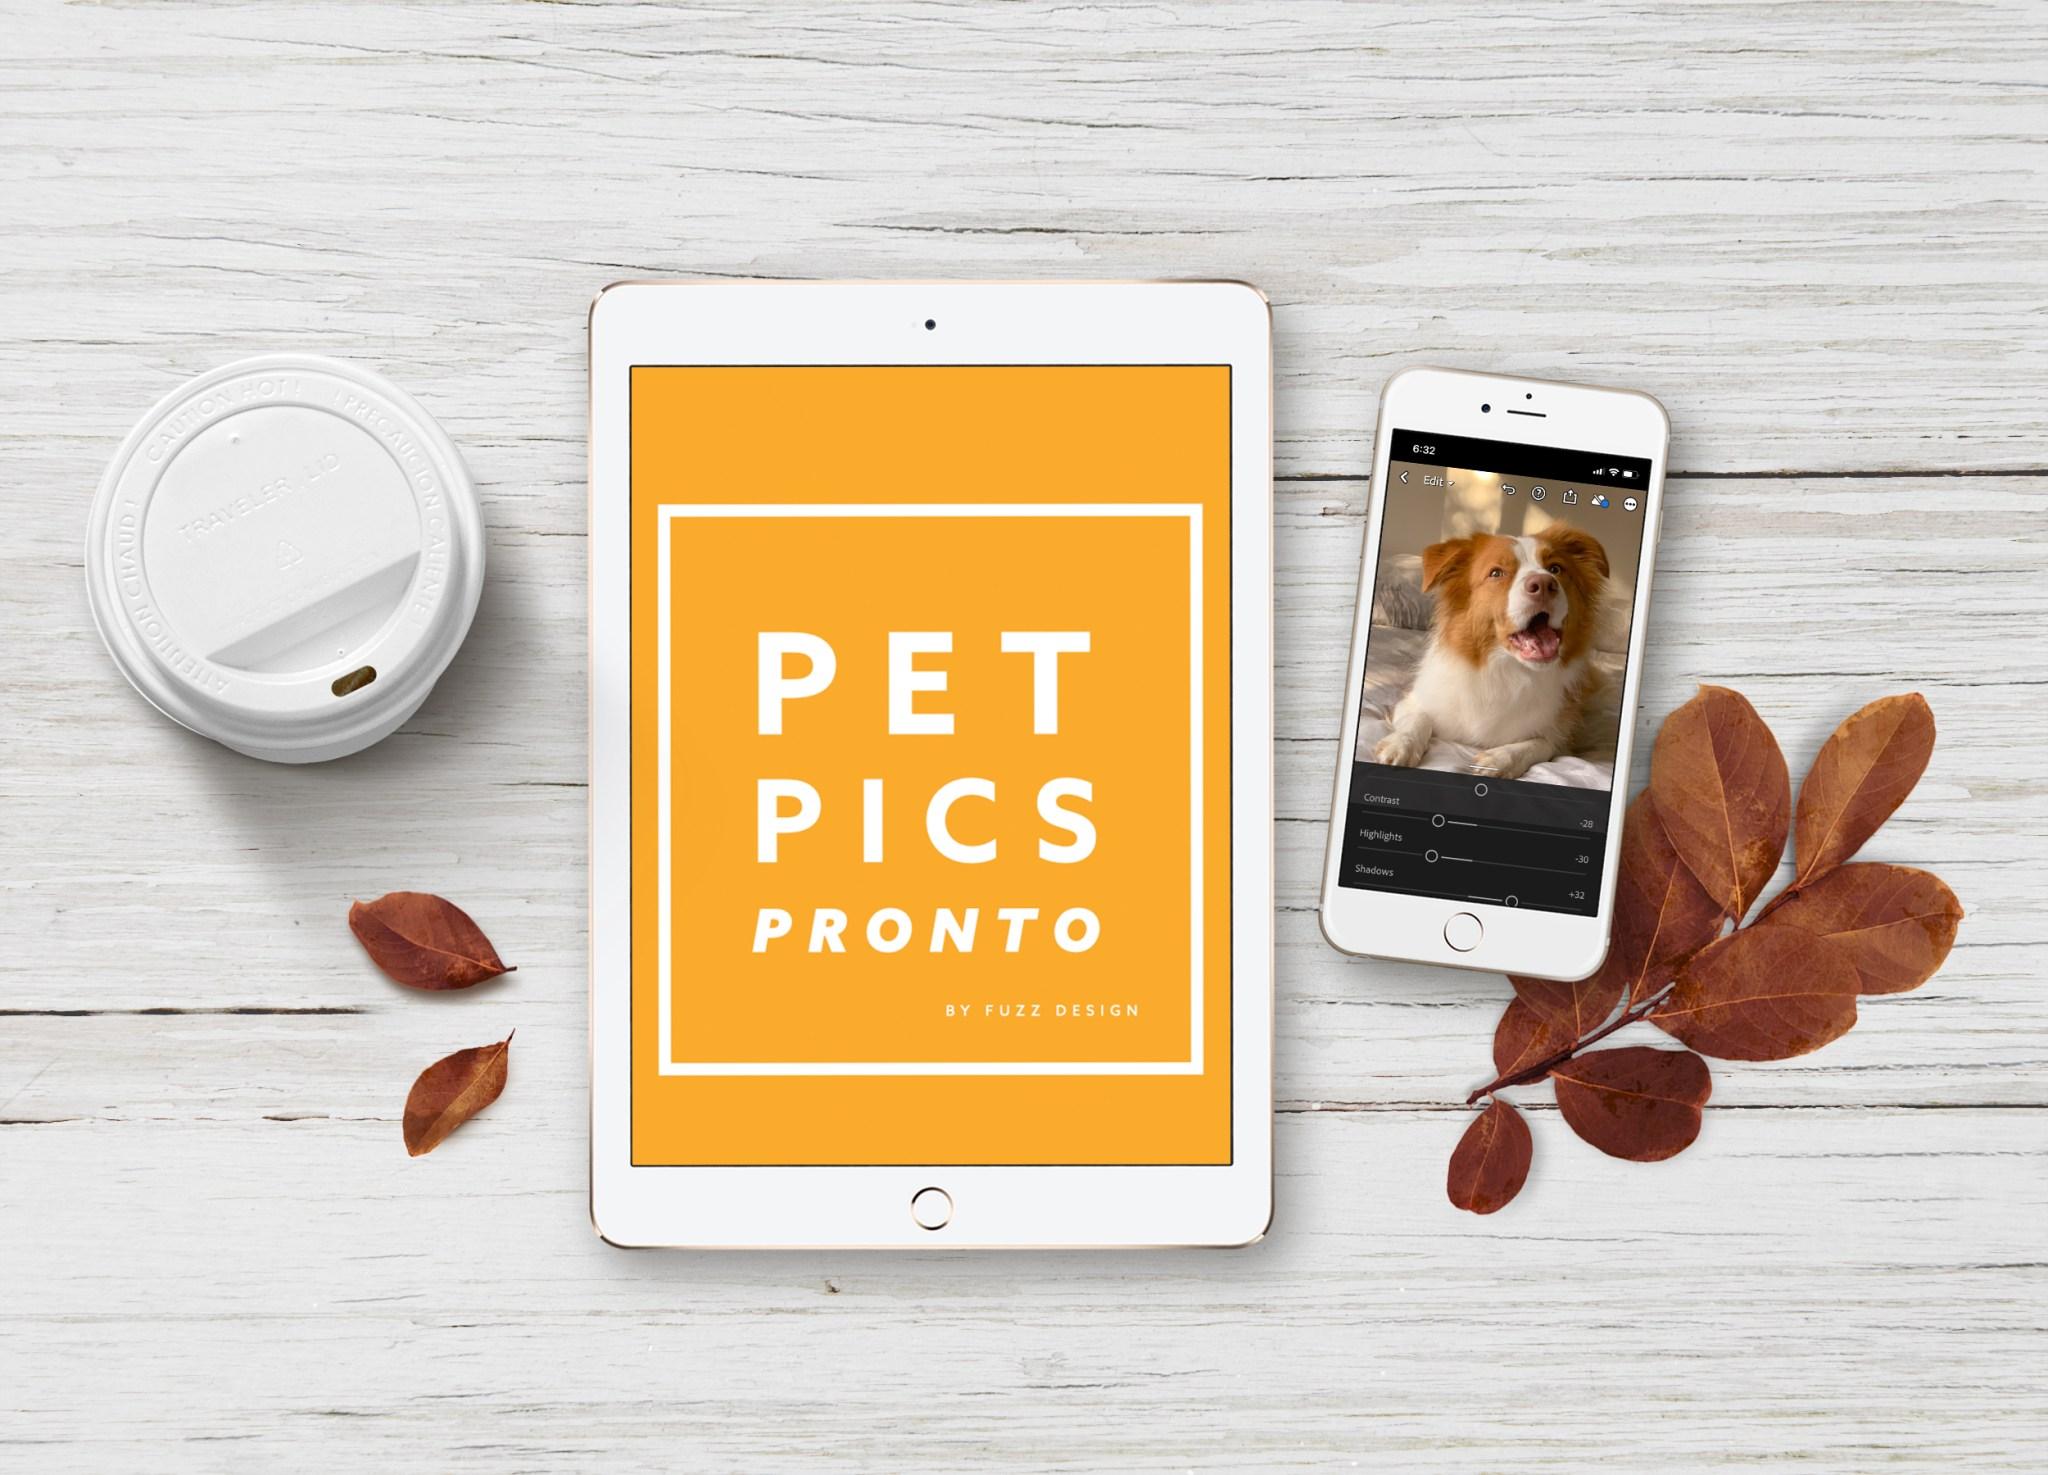 pet_photo_course image iphone tablet